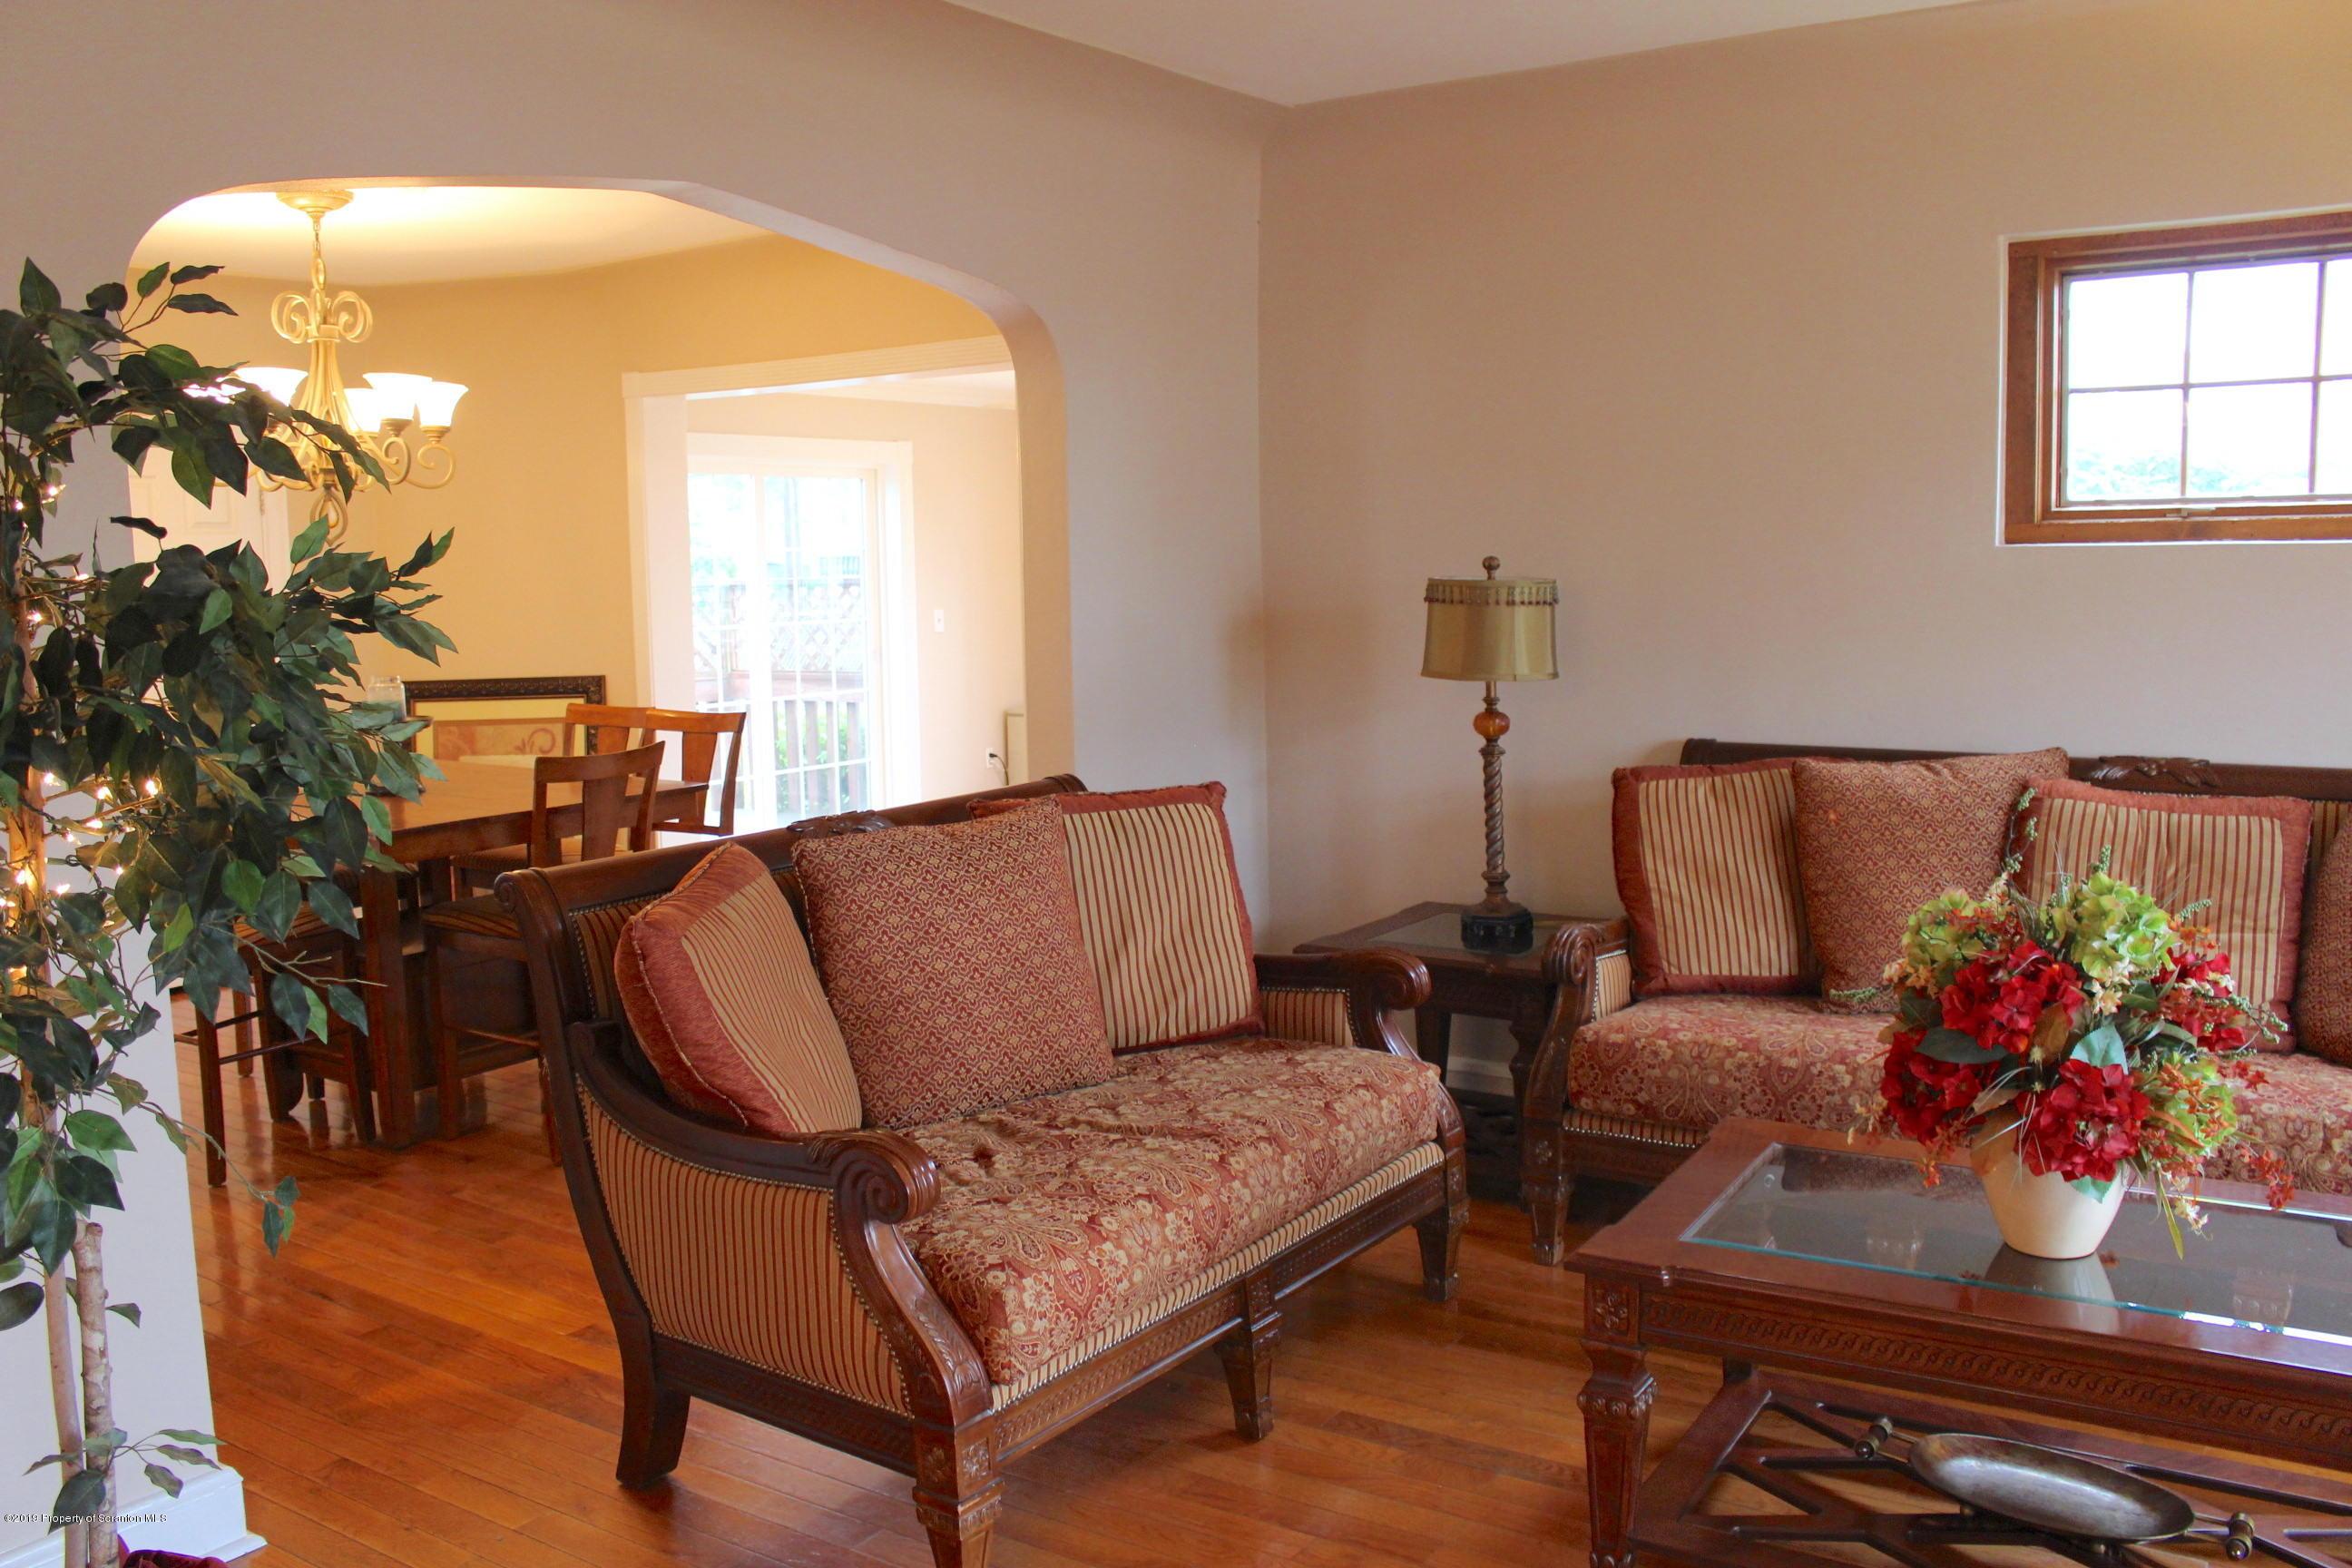 329 Stafford Ave, Scranton, Pennsylvania 18505, 4 Bedrooms Bedrooms, 8 Rooms Rooms,3 BathroomsBathrooms,Single Family,For Sale,Stafford,18-4736